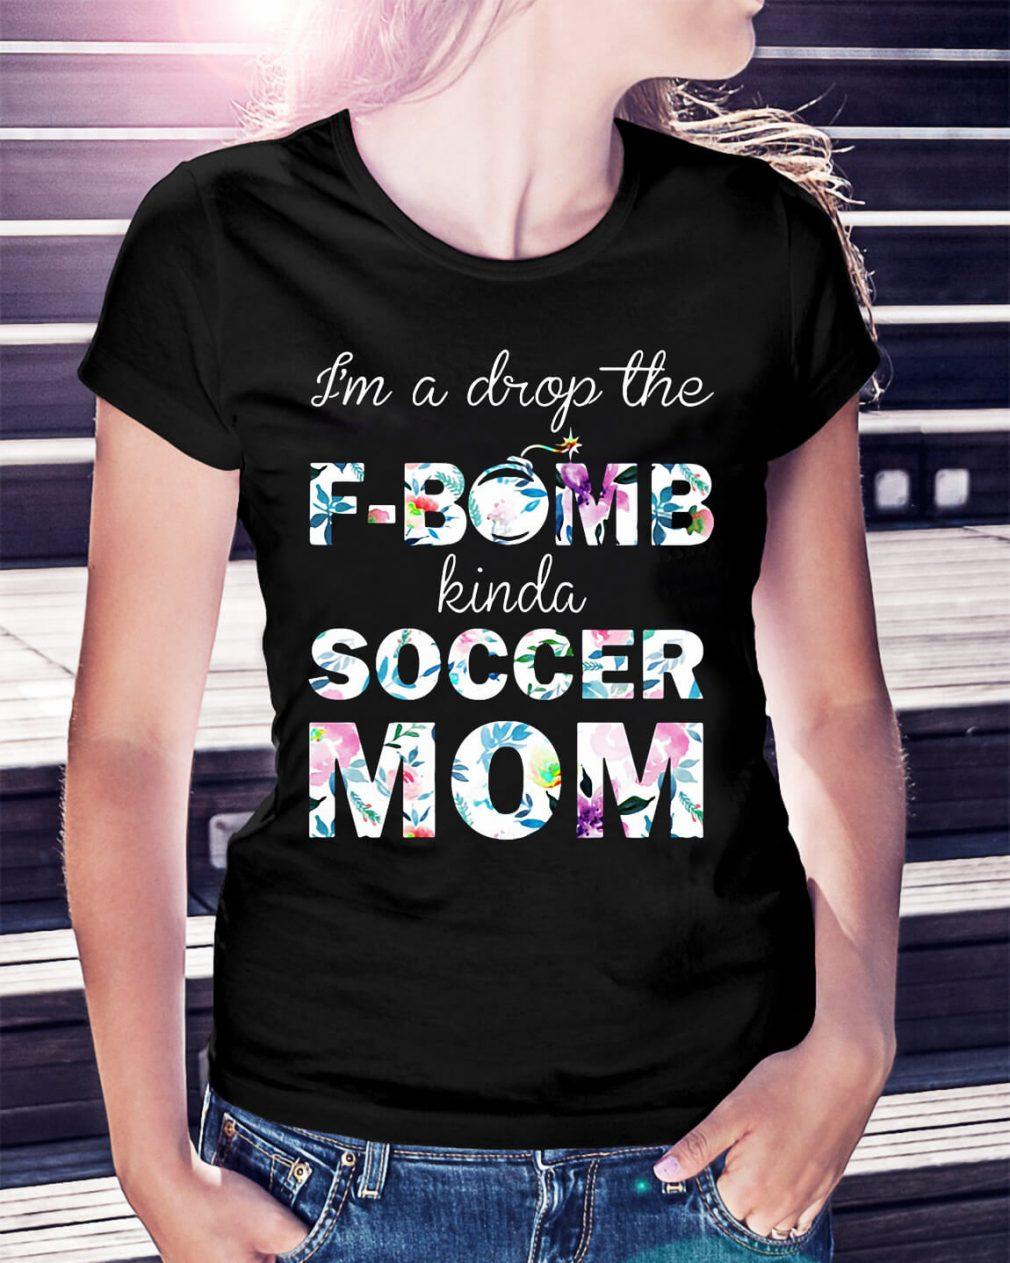 I'm a drop the f-bomb kinda soccer mom shirt